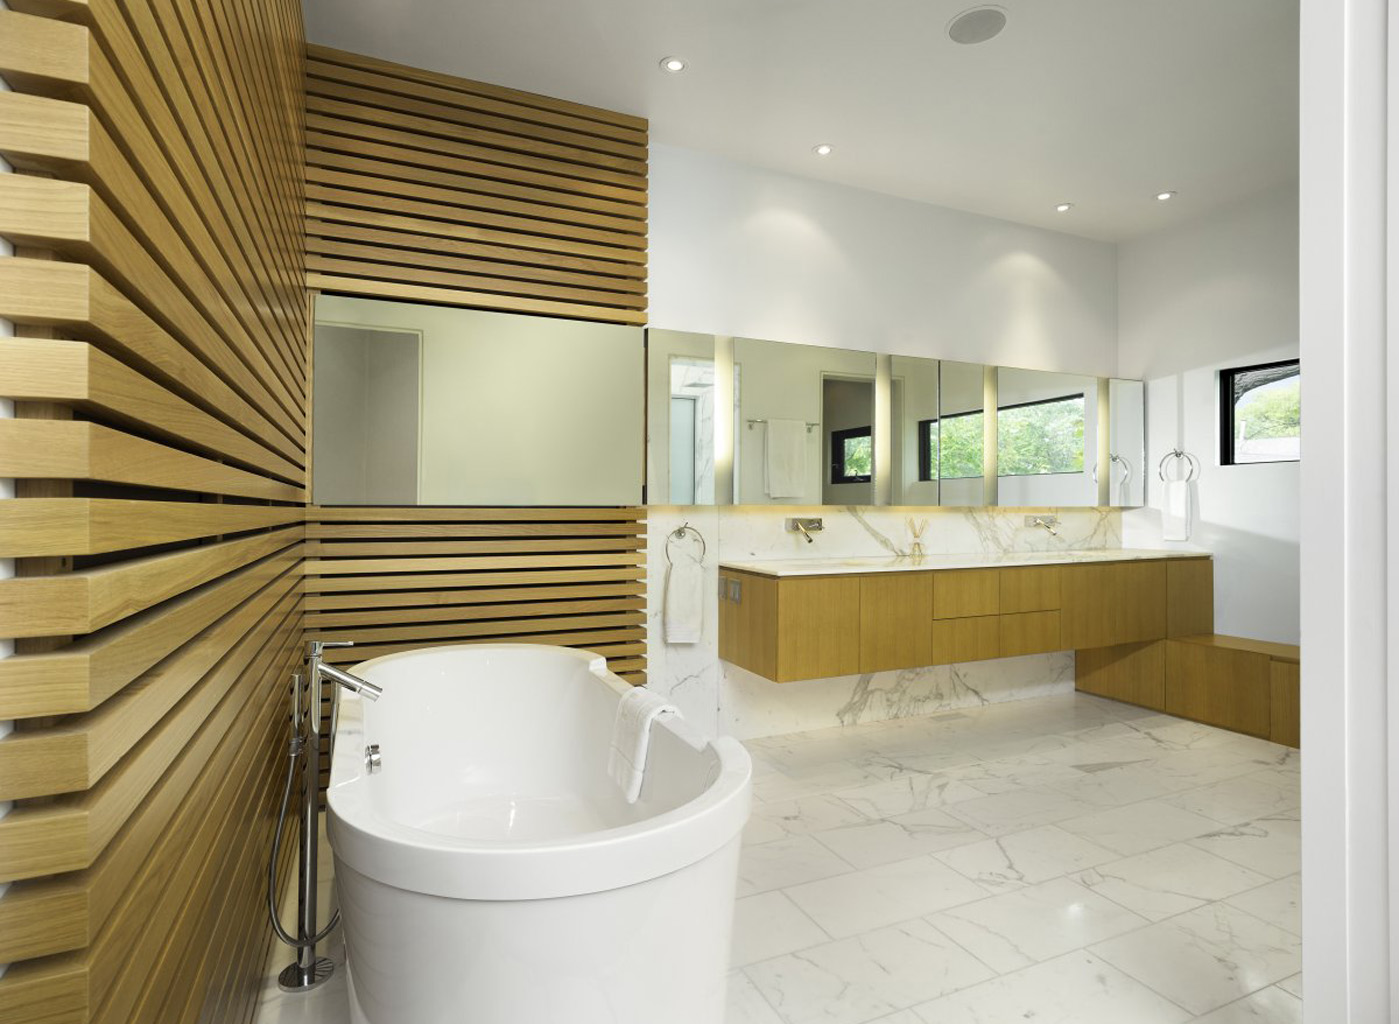 aménagement salles de bains artisan Herbignac 44